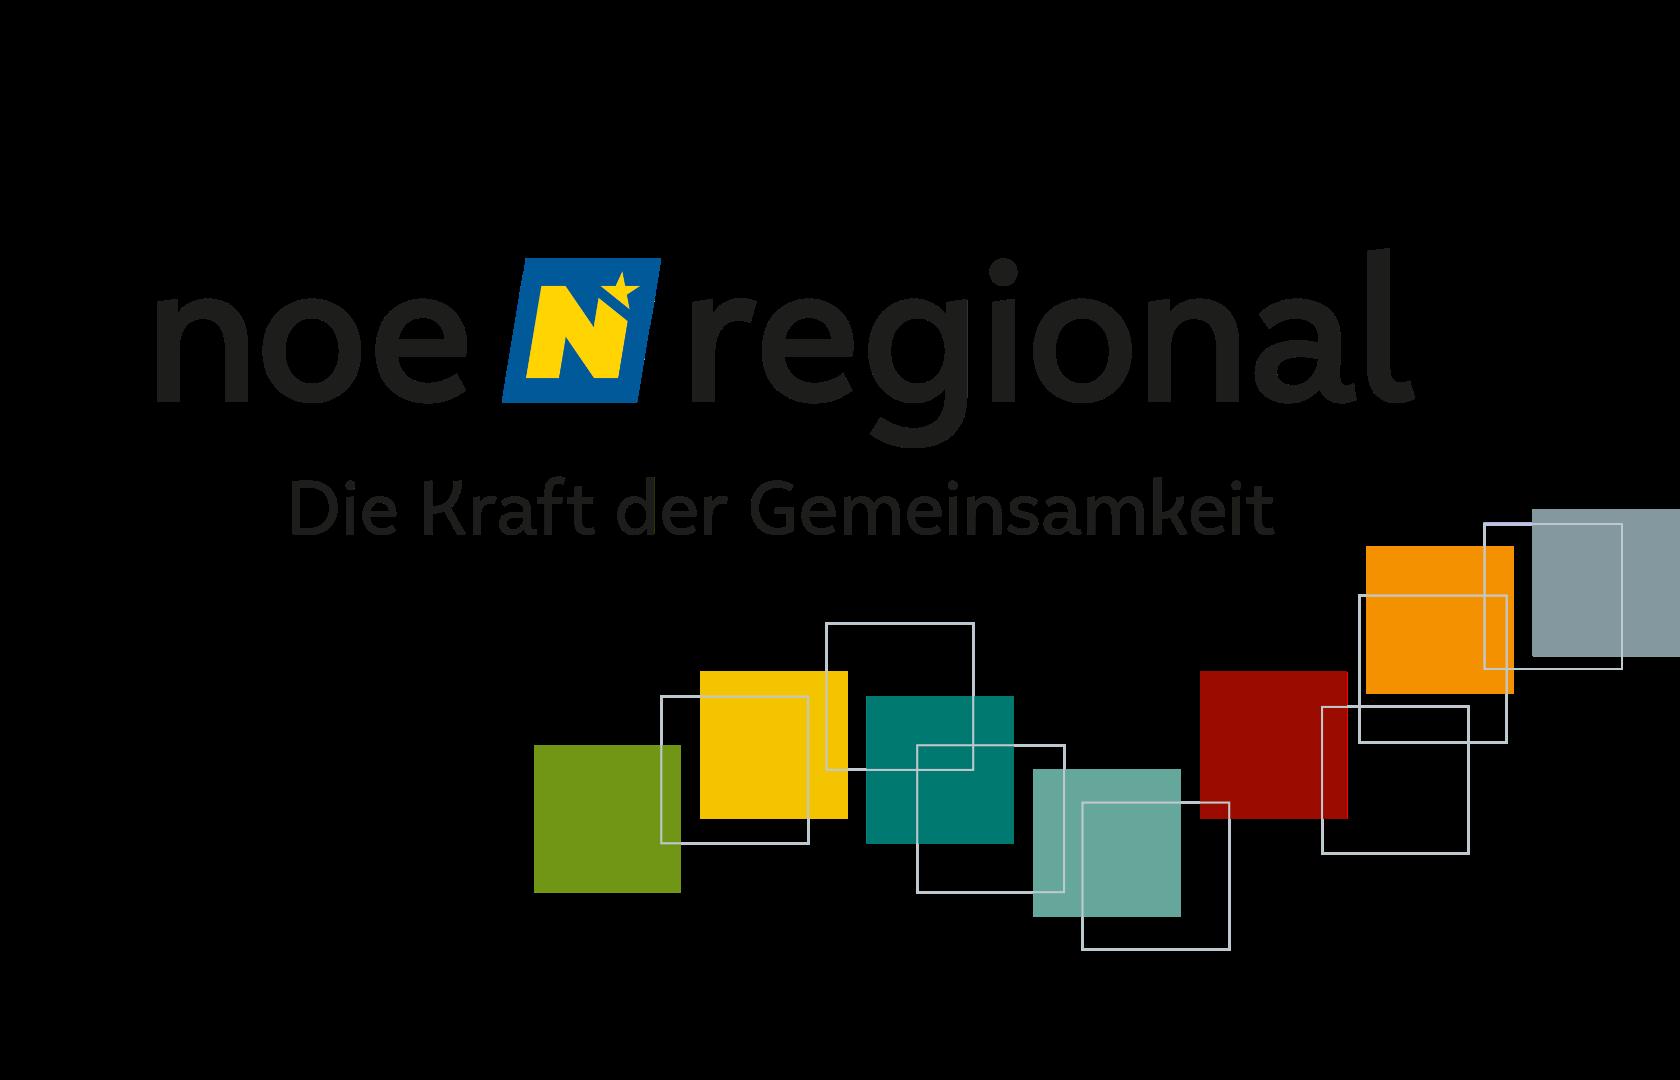 logo-noeregional.png